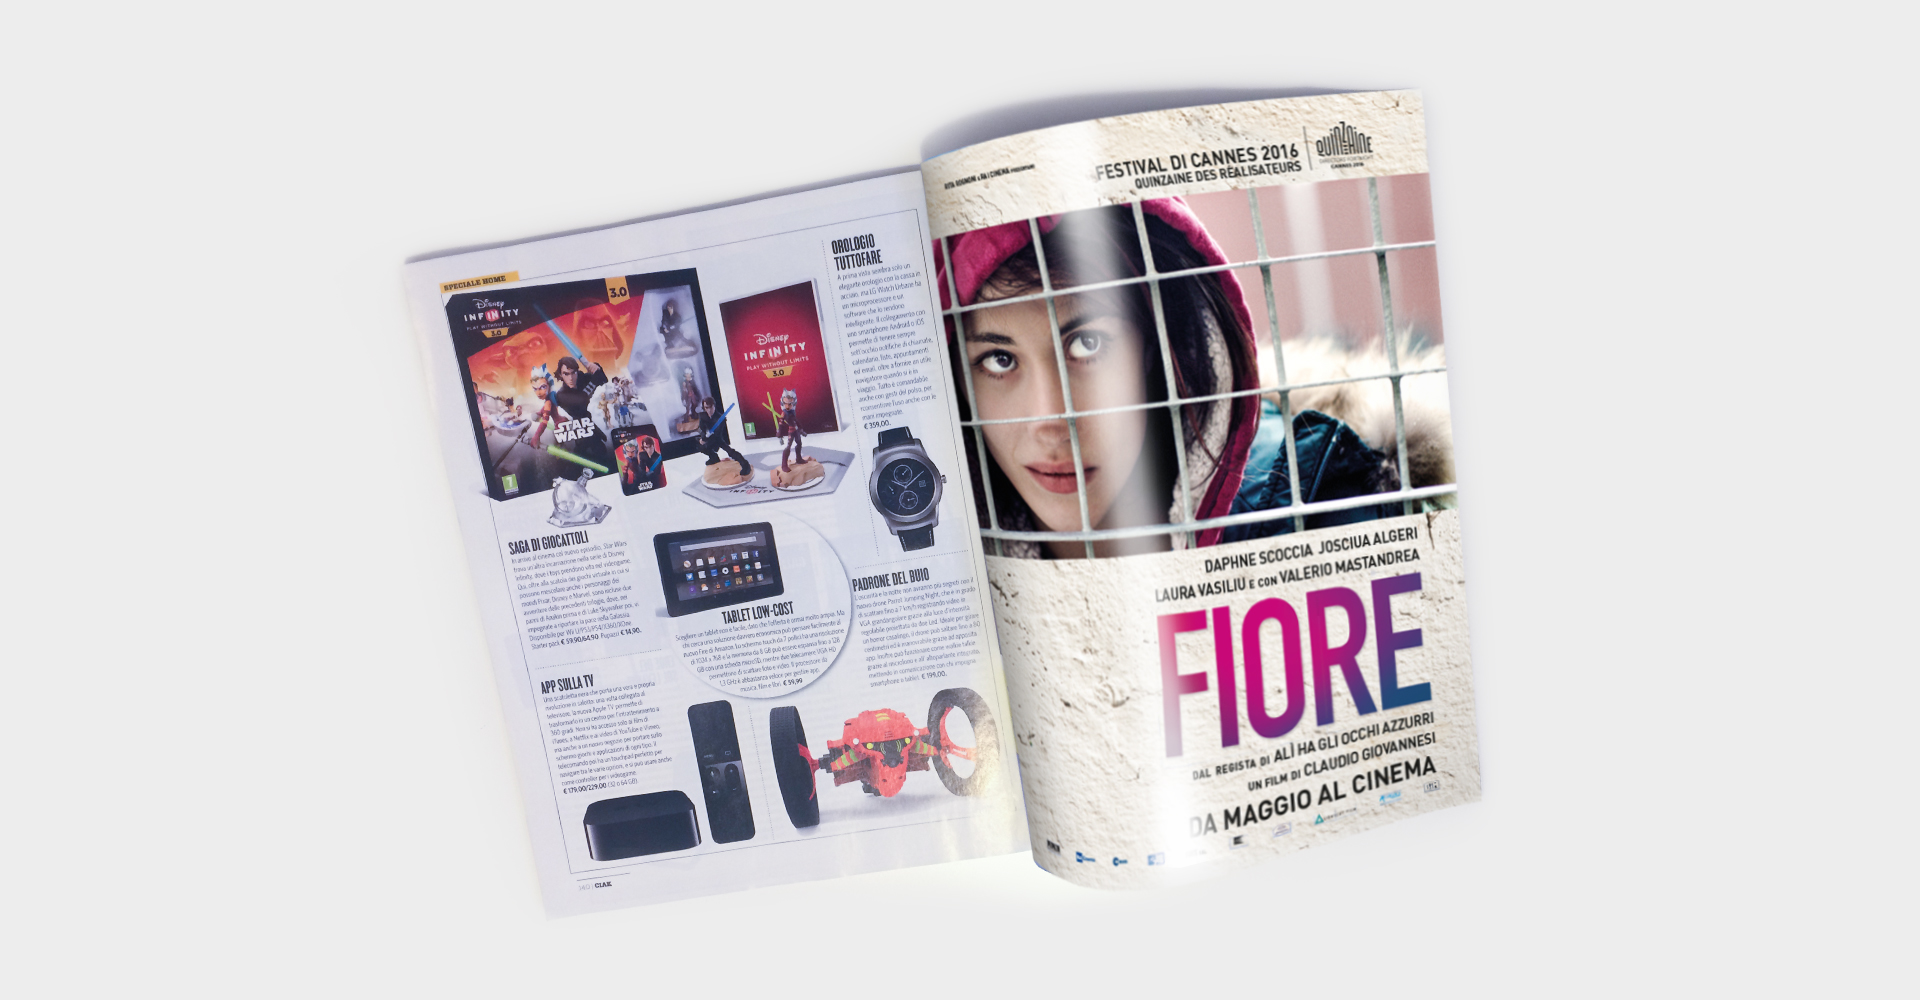 Fiore_06